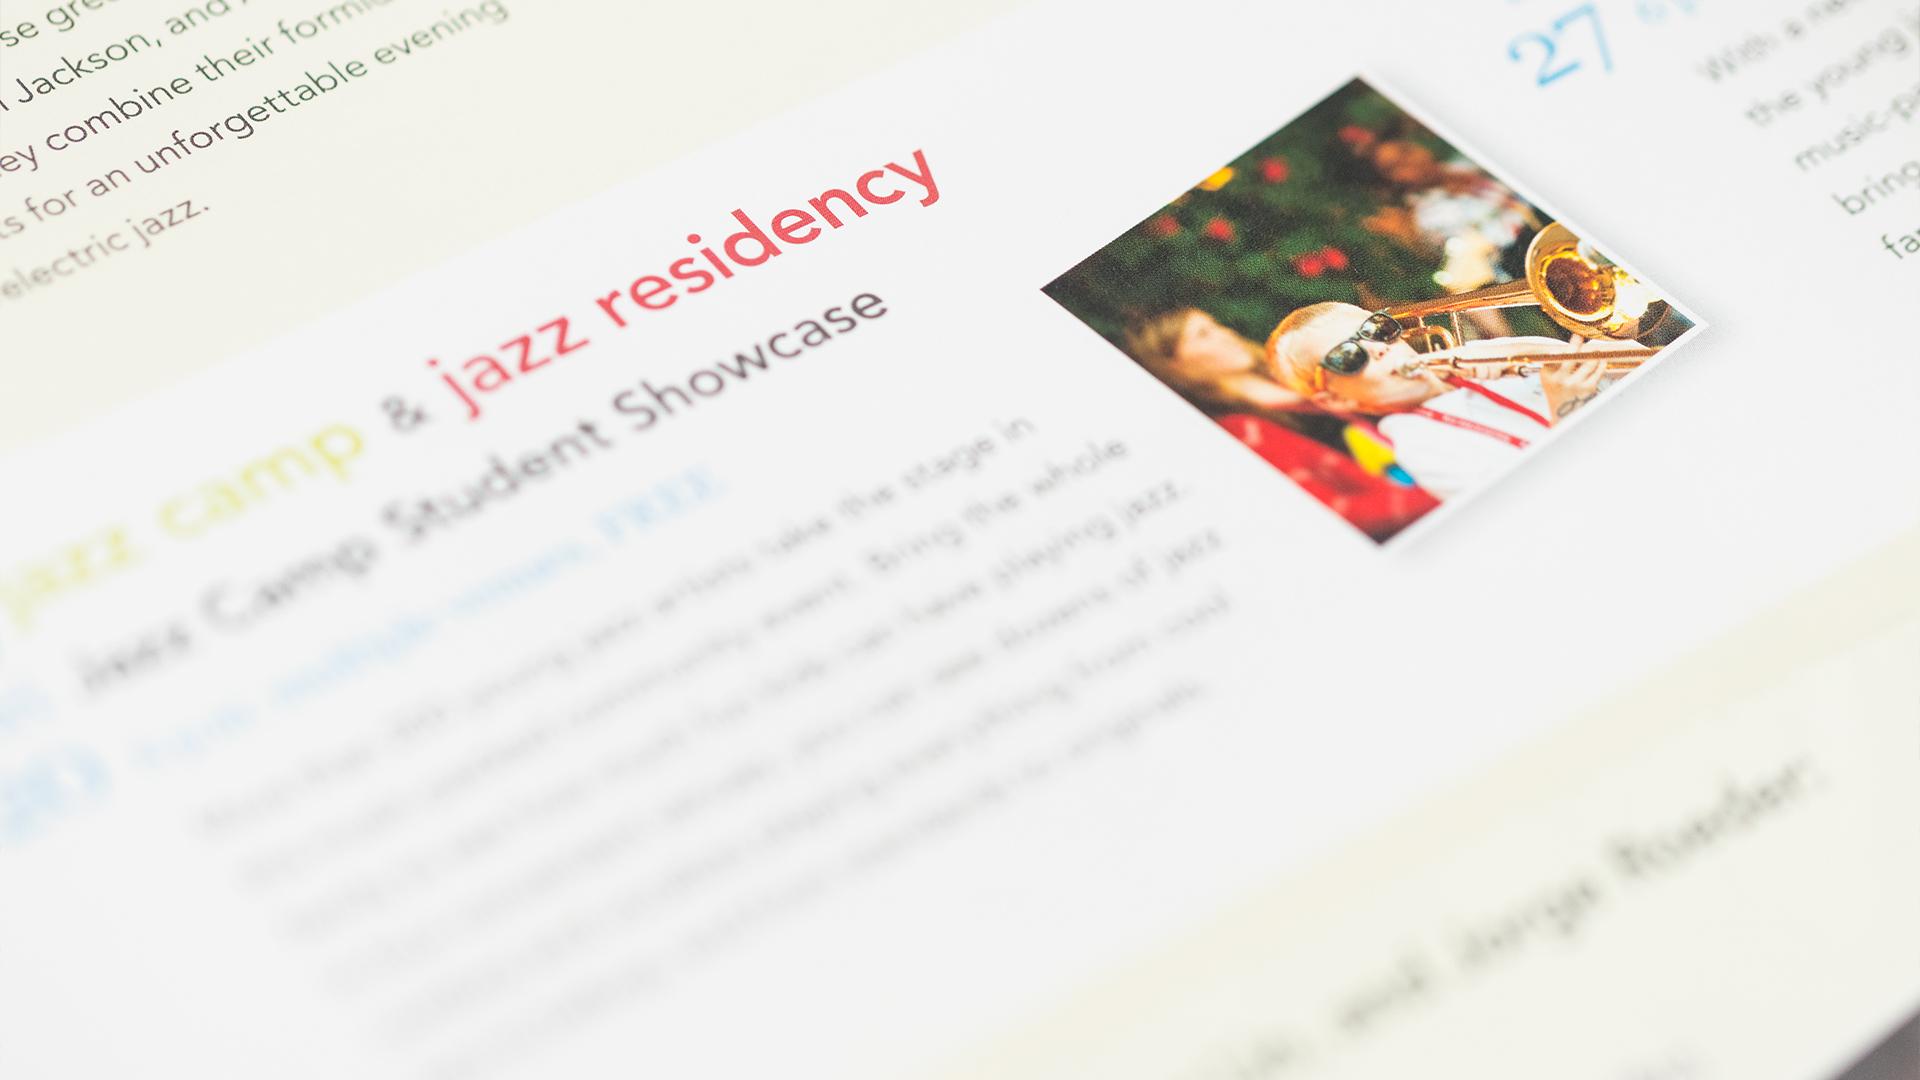 Print – Festival Mailer – Poster Side (SJW Showcase Close-Up)